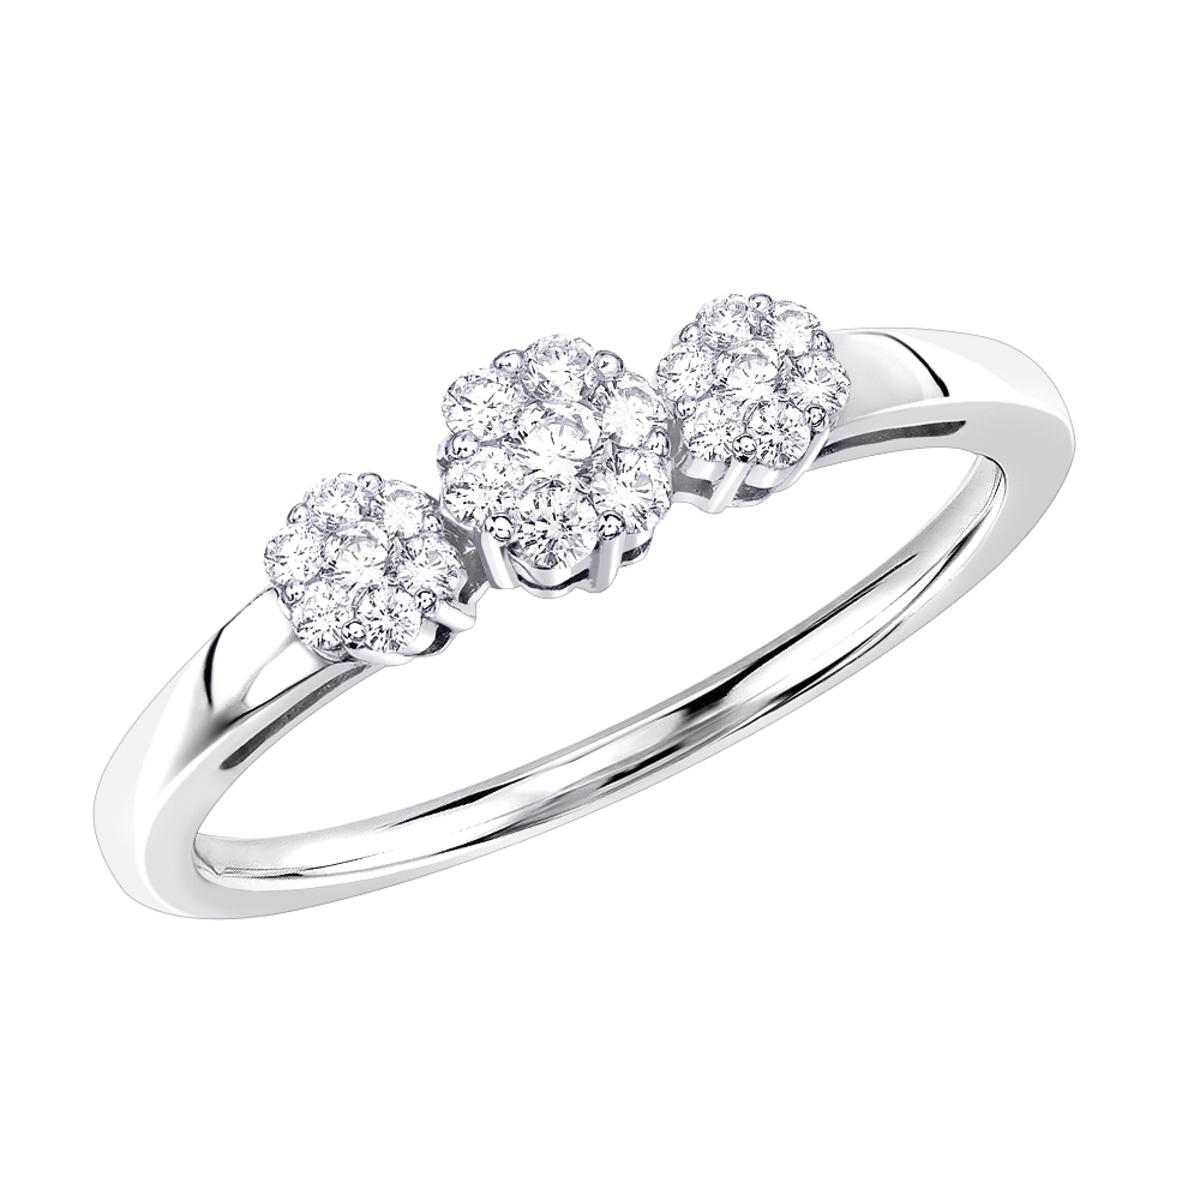 Thin 14K Gold Diamond Cluster Ring Past Present Future 0.25ct